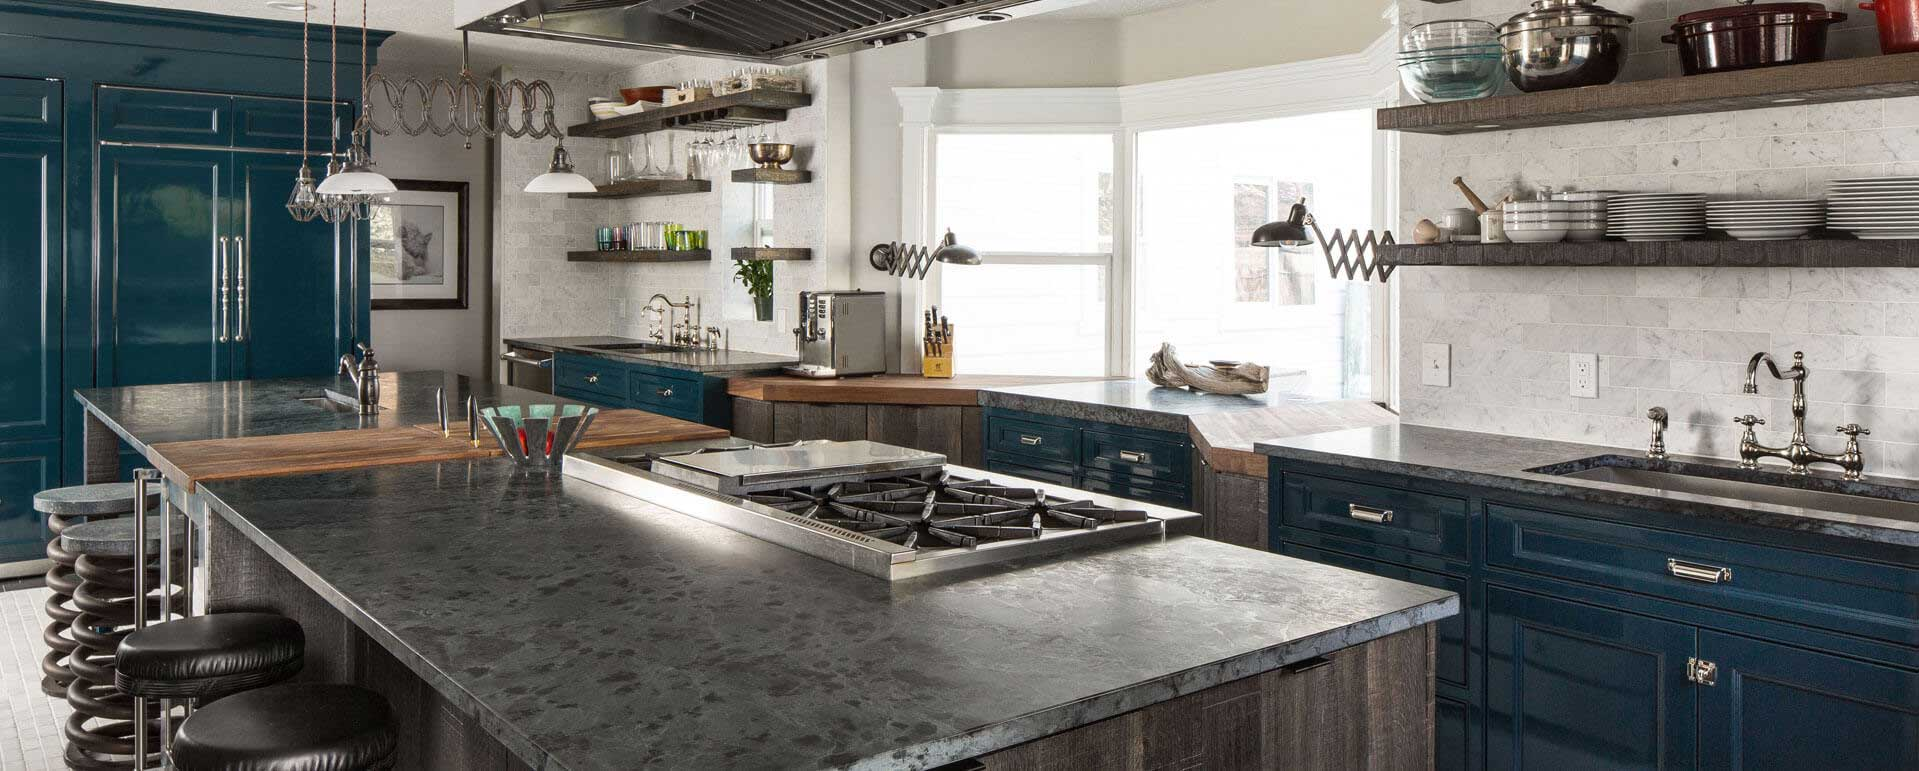 Bedrock Quartz Countertops Store Granite Quartz Backsplash Tile Sinks Faucets Design Center